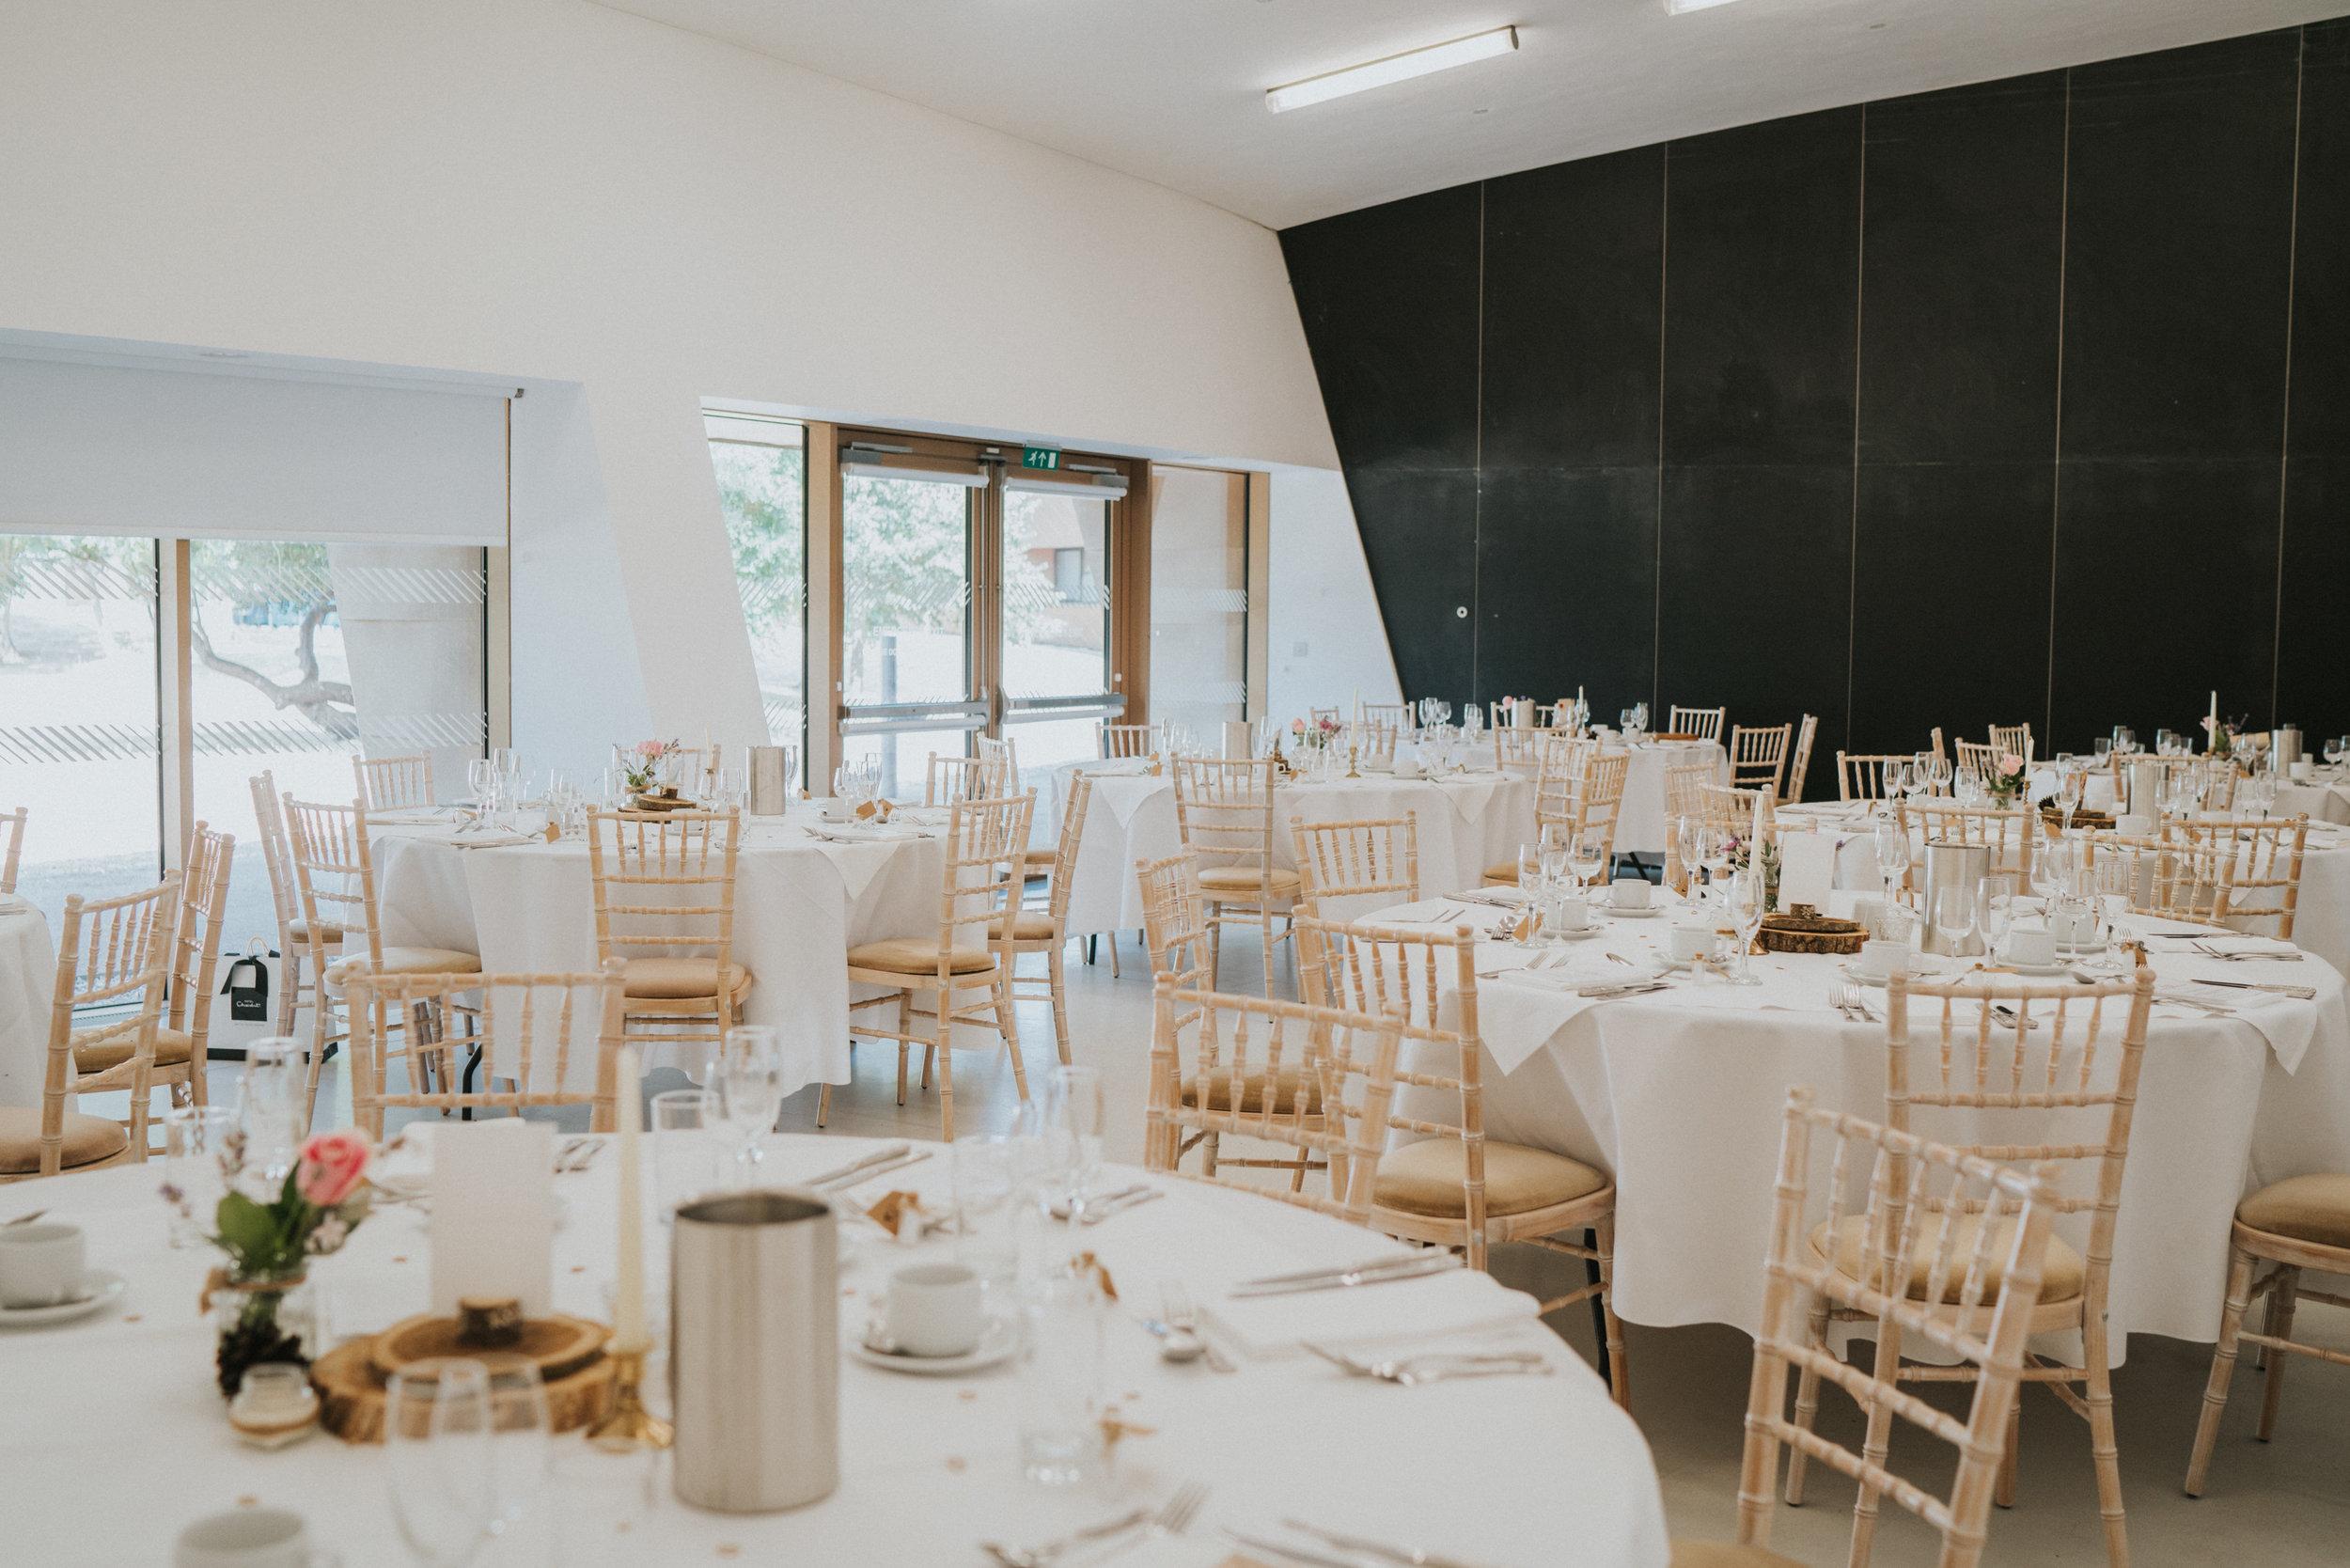 Grace-Elizabeth-Georgie-Amalaketu-Firstsite-Colchester-Essex-Boho-Buddhist-Wedding-Alternative-Wedding-Photography-Essex (72 of 100).jpg